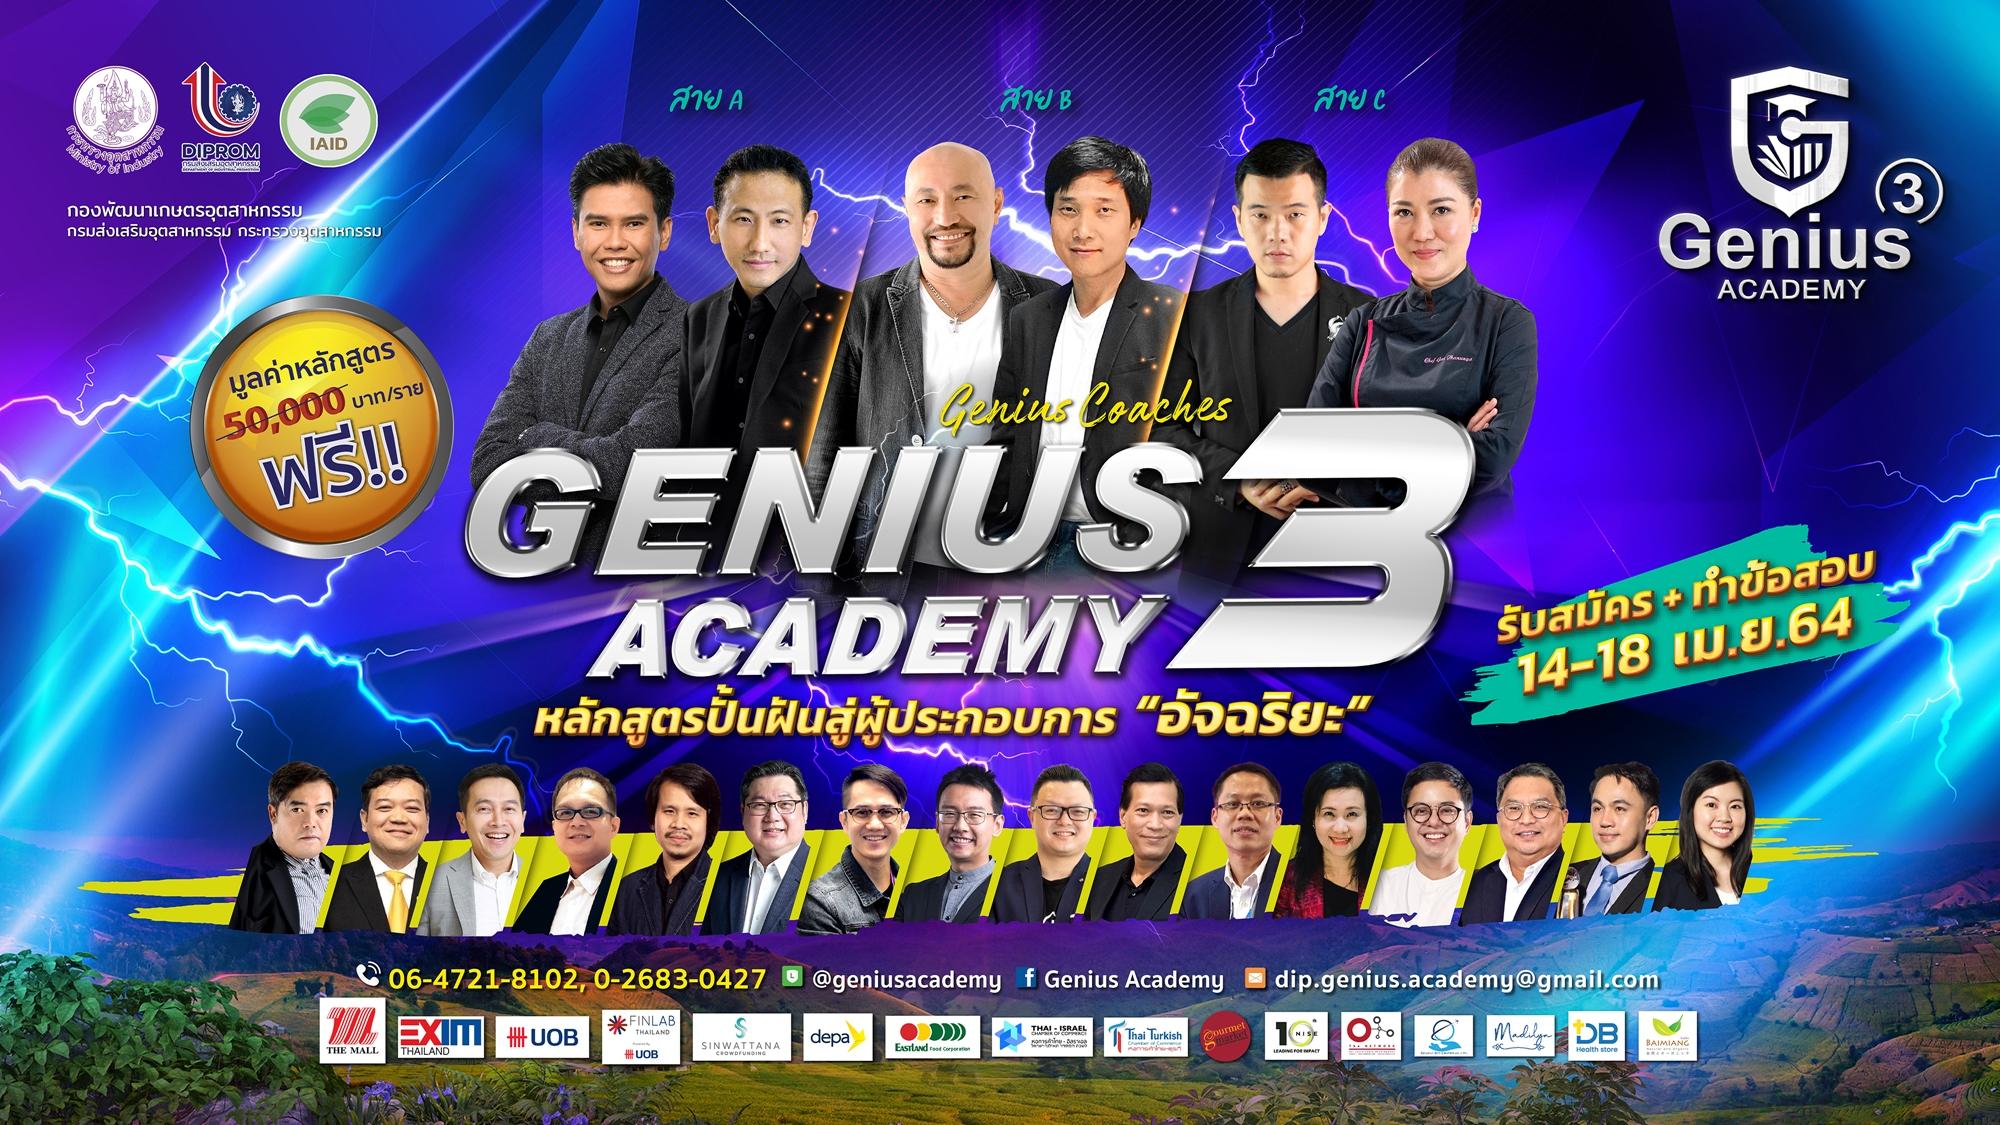 Genius Academy 3 กรมส่งเสริมอุตสาหกรรม